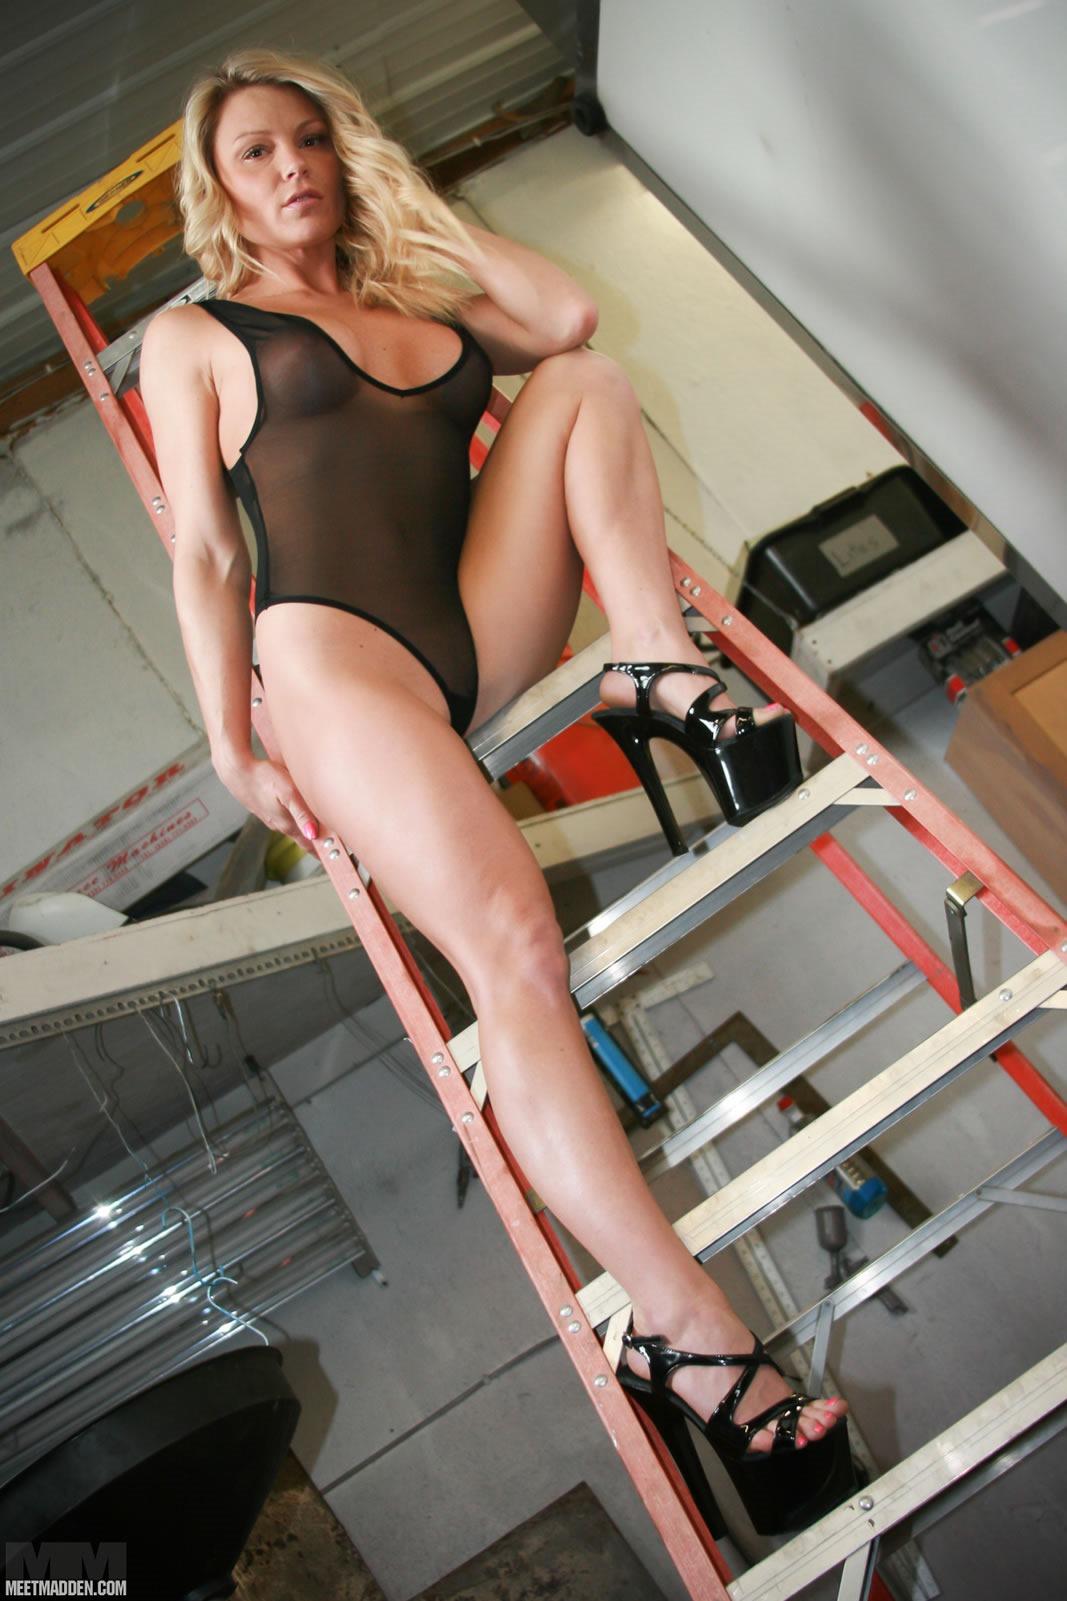 Sheer Ladder - Fine Hotties - Hot Naked Girls, Celebrities ...